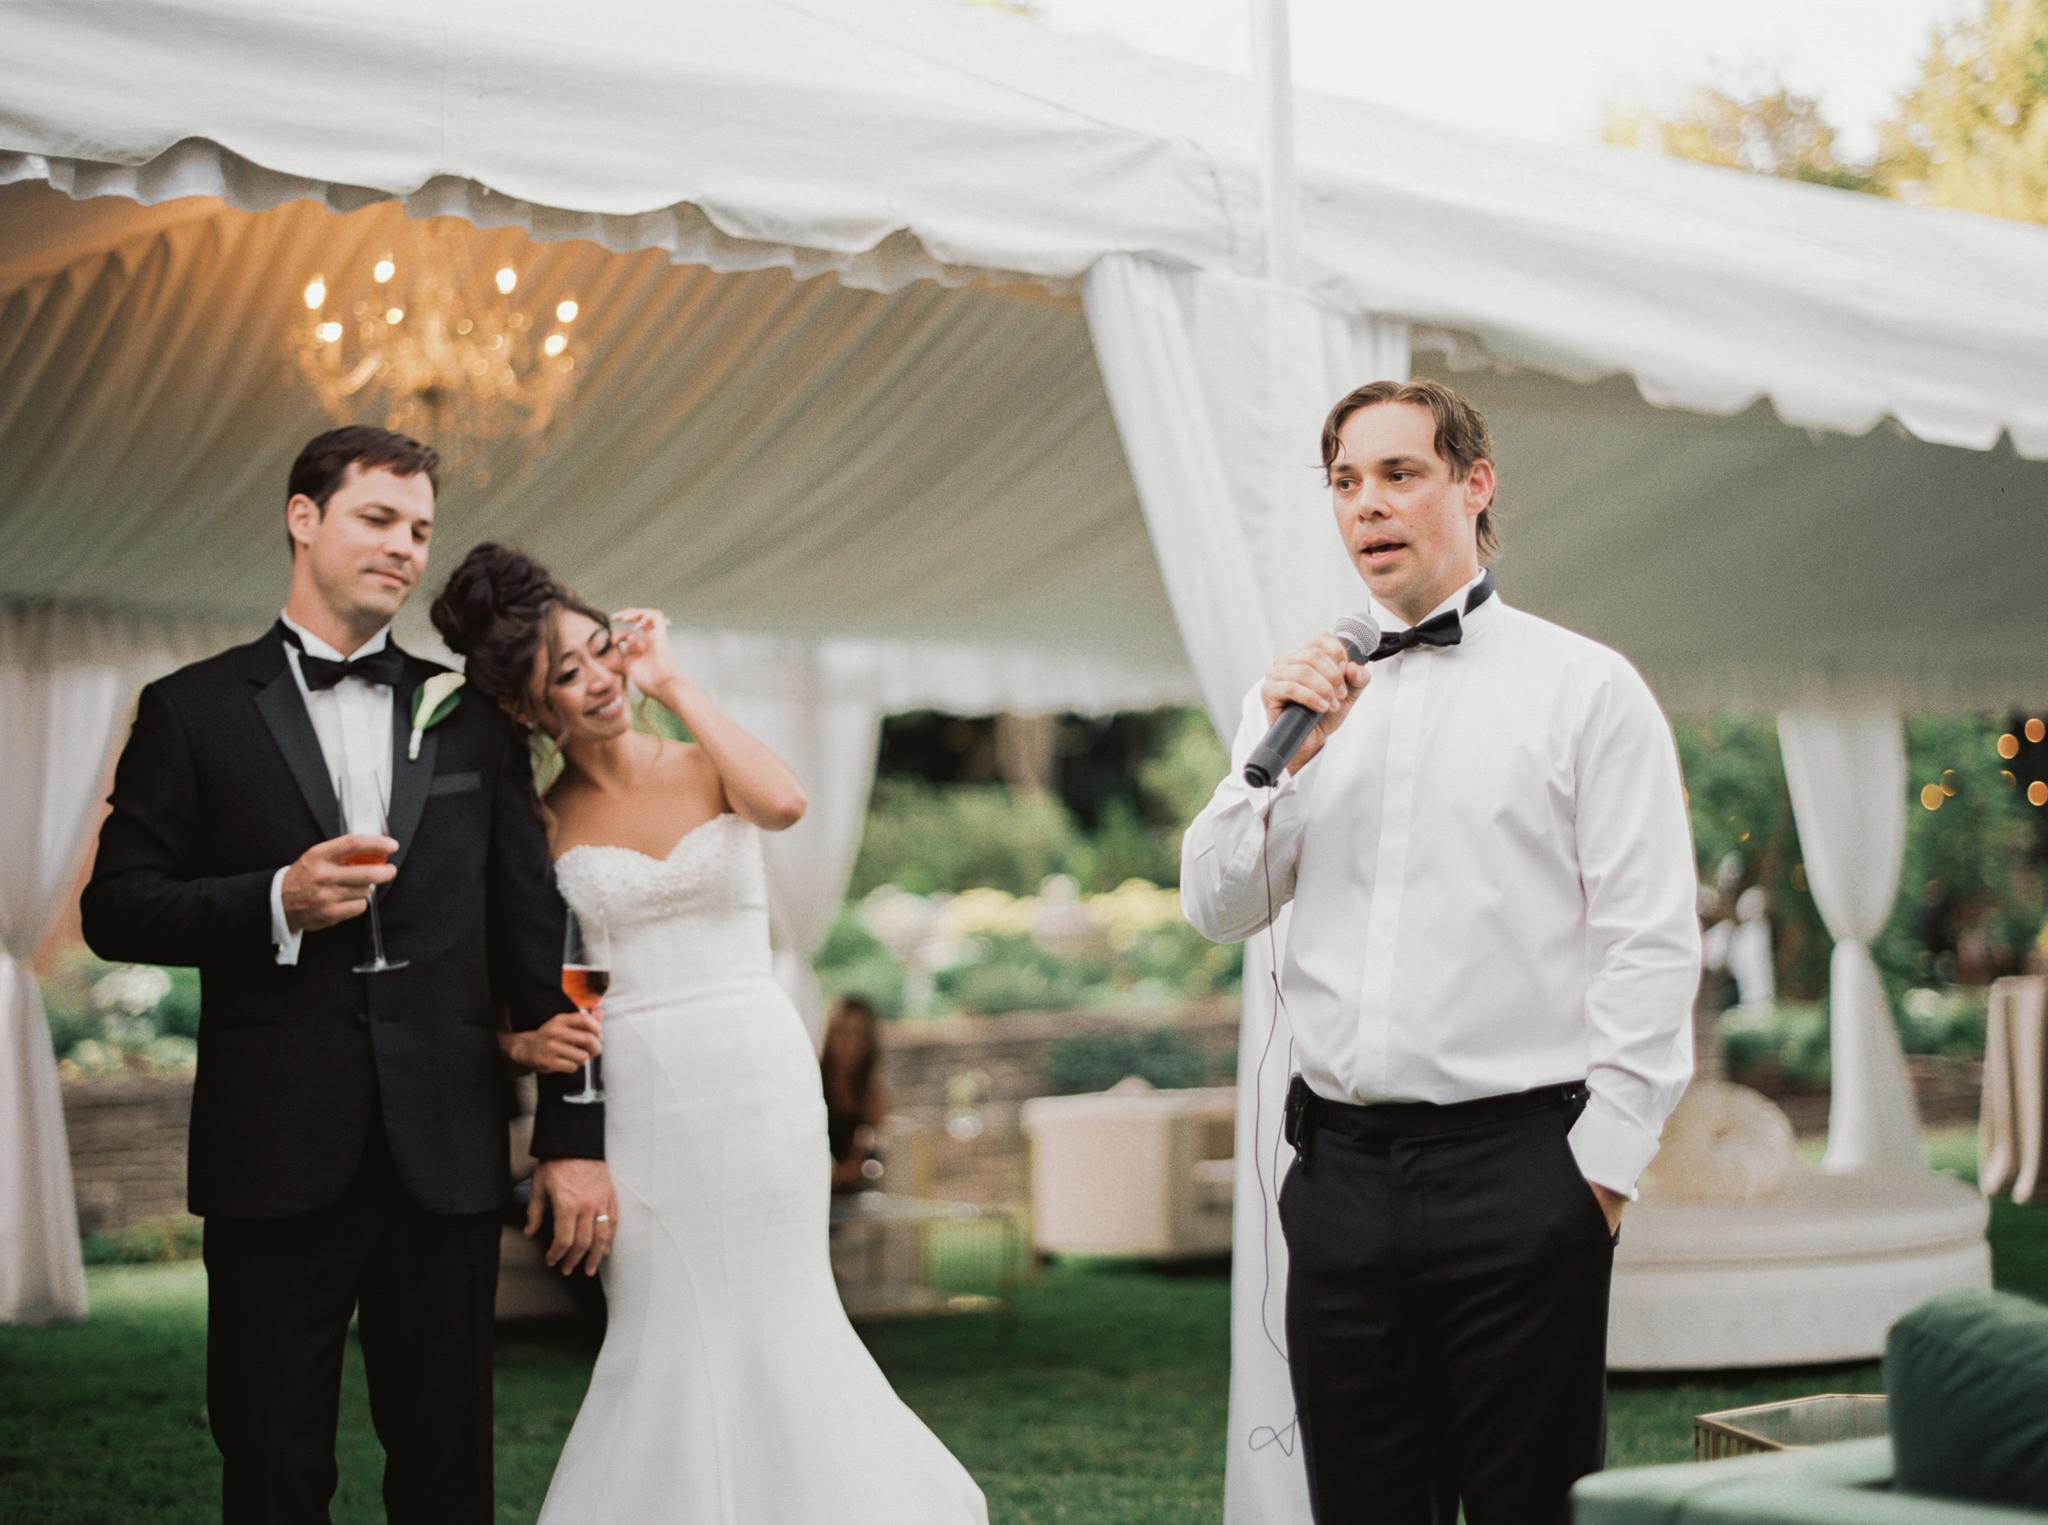 204OutliveCreative_Travel_Photographer_Videographer_Lewis&Clark_Oregon_Elegant_BlackTie_Destination_Wedding.jpg